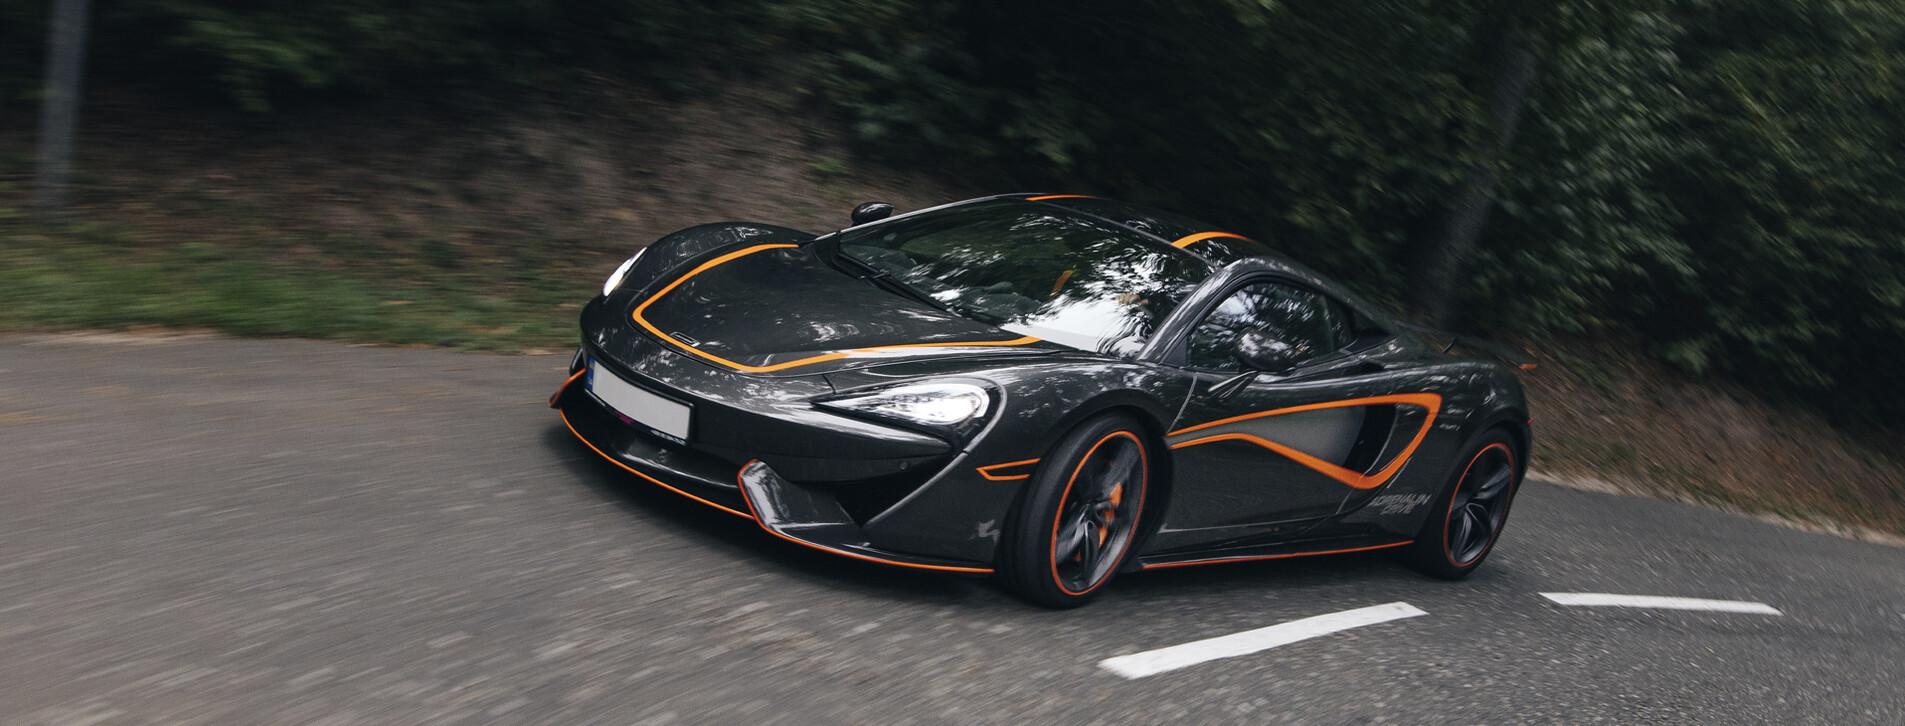 Фото 1 - Тест-драйв суперкара McLaren